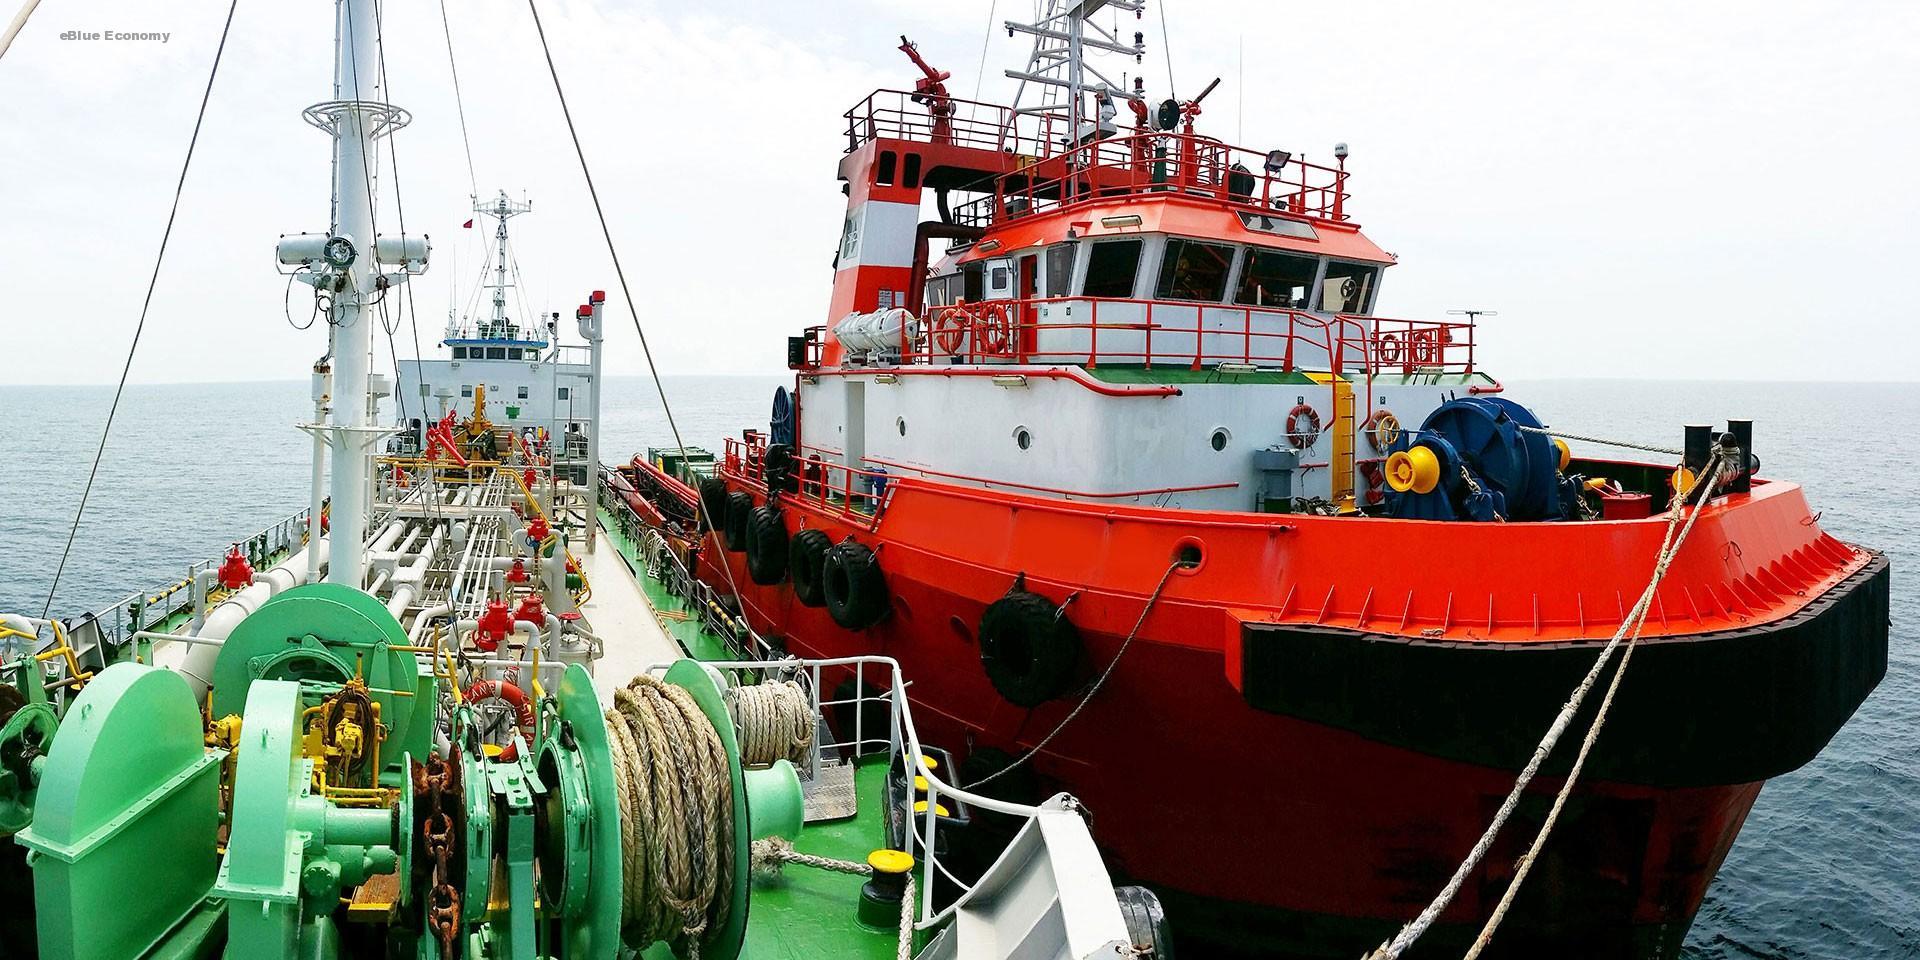 eBlue_economy_RBB Ship Chartering